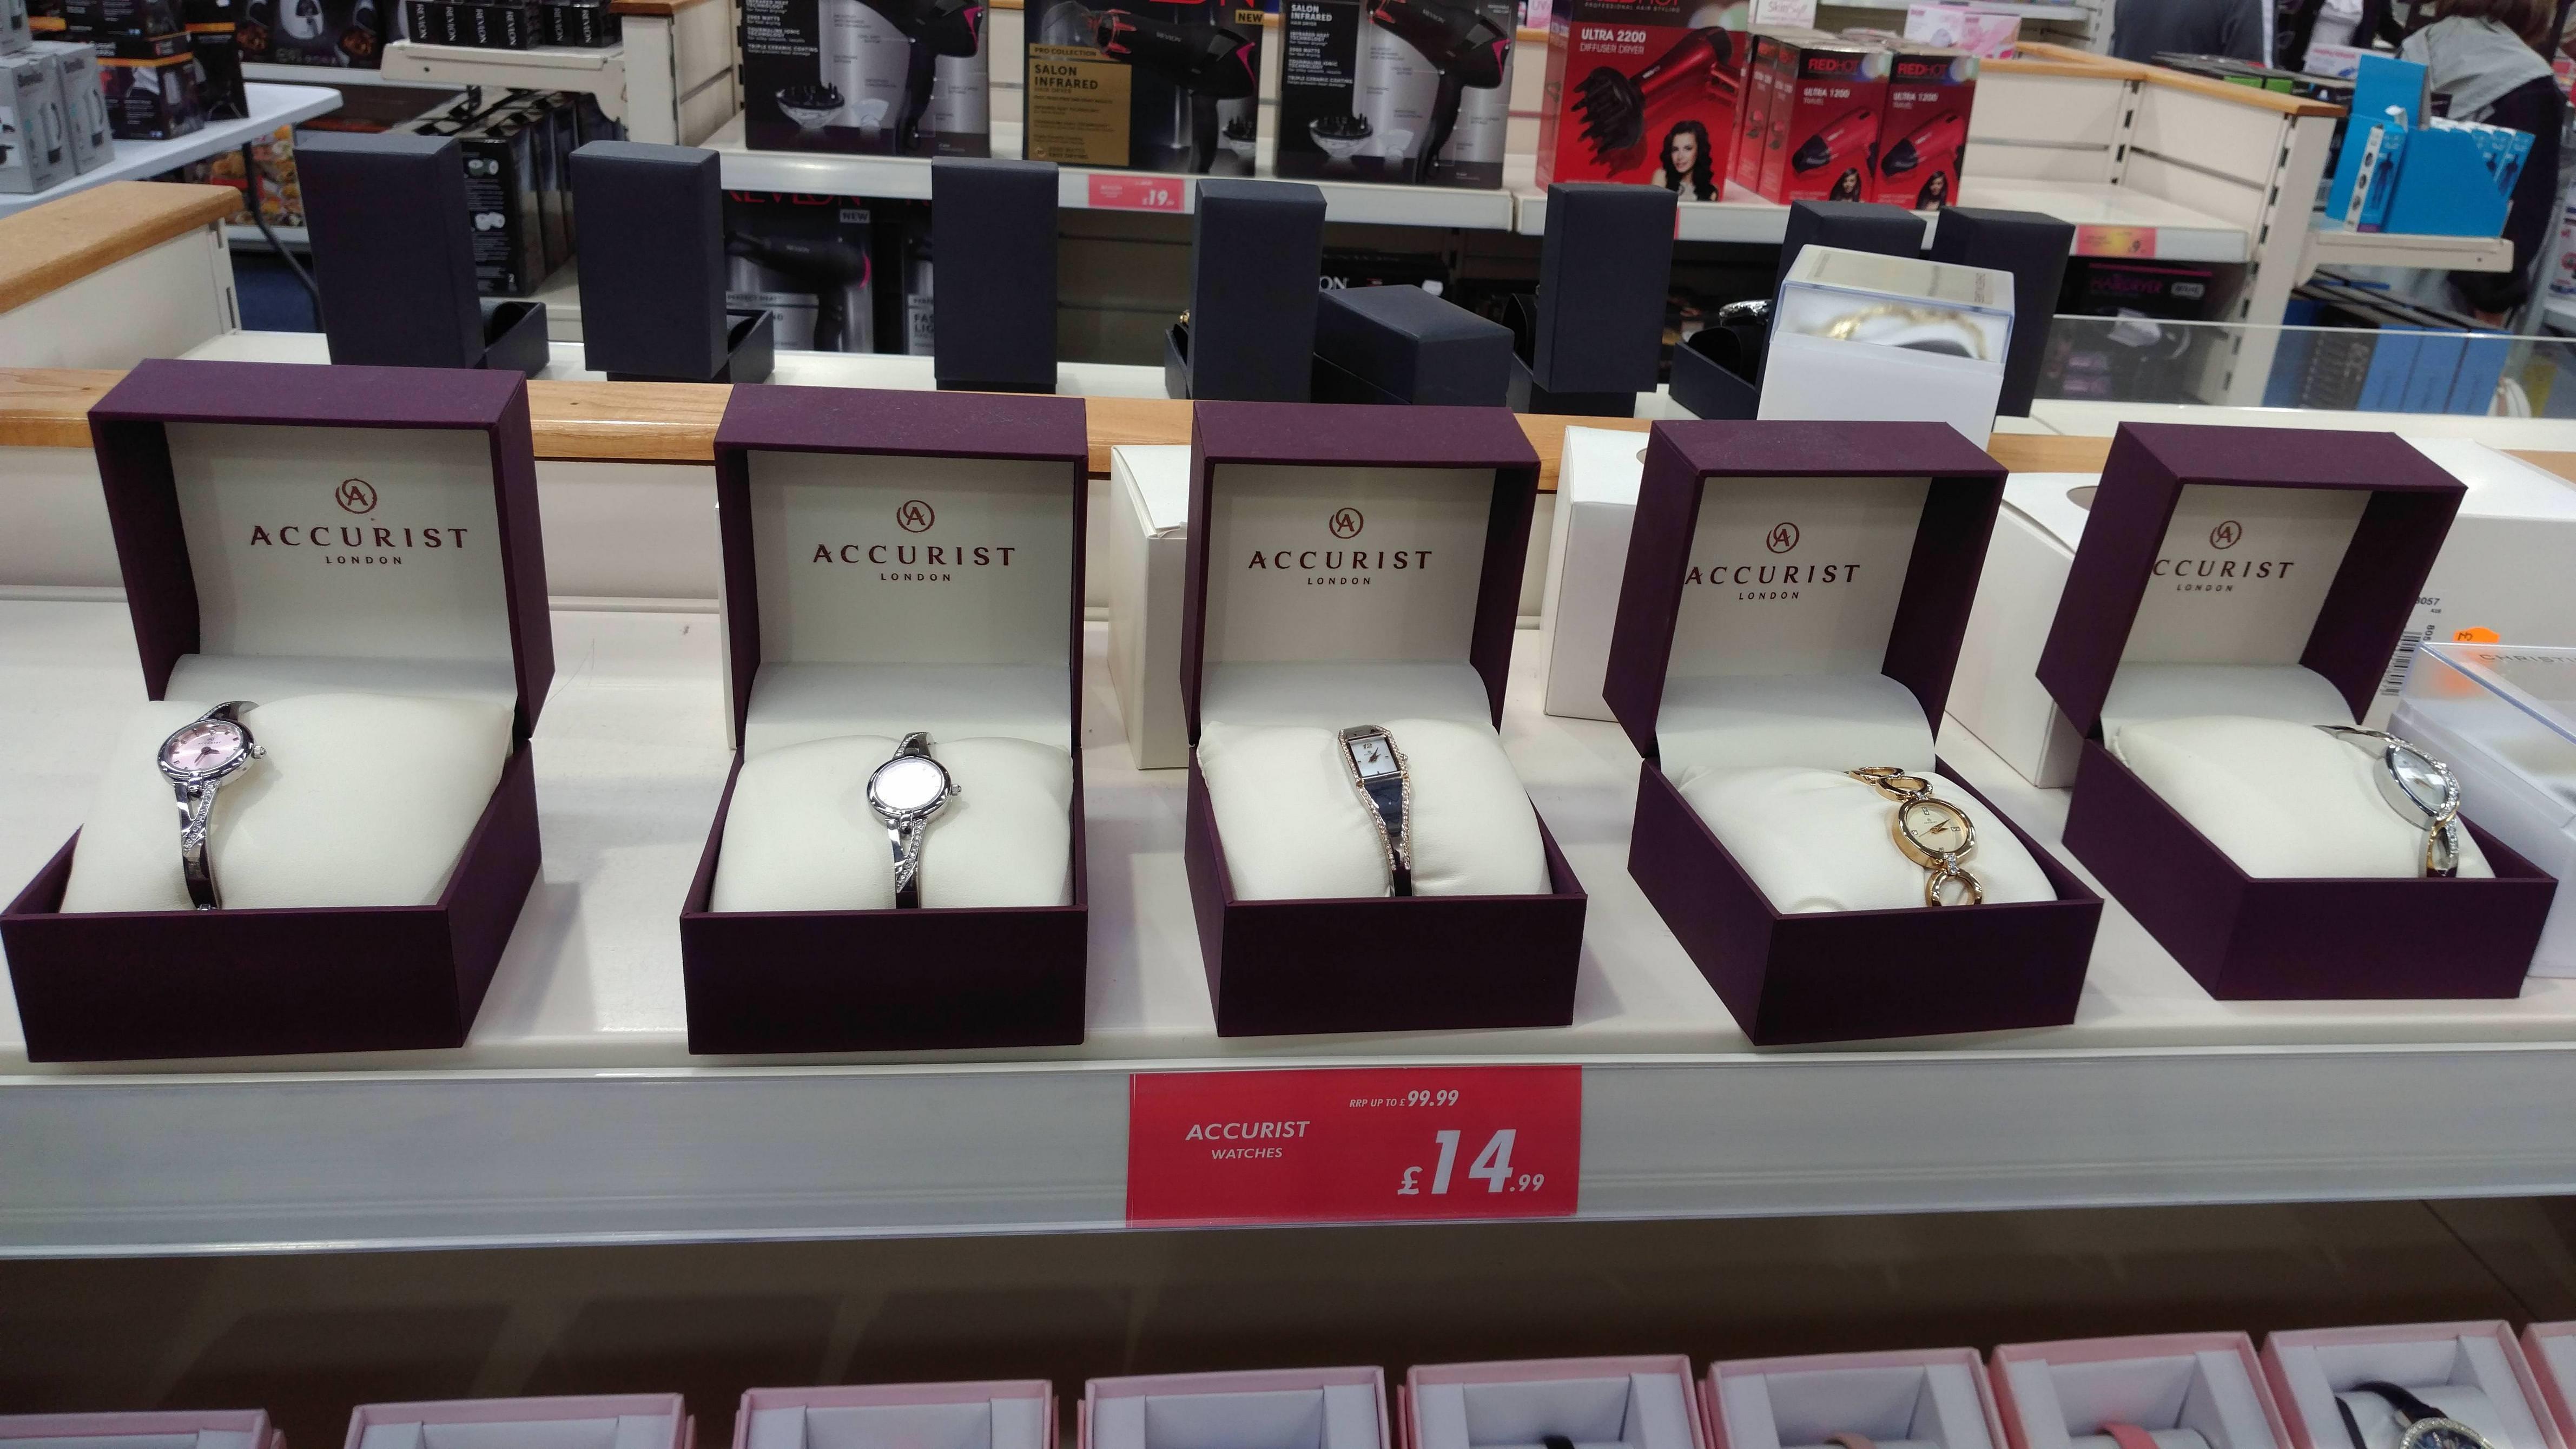 Ladies' Accurist Dress Watches For £14.99 @ Watt Bros, Robroyston, Glasgow, In Store